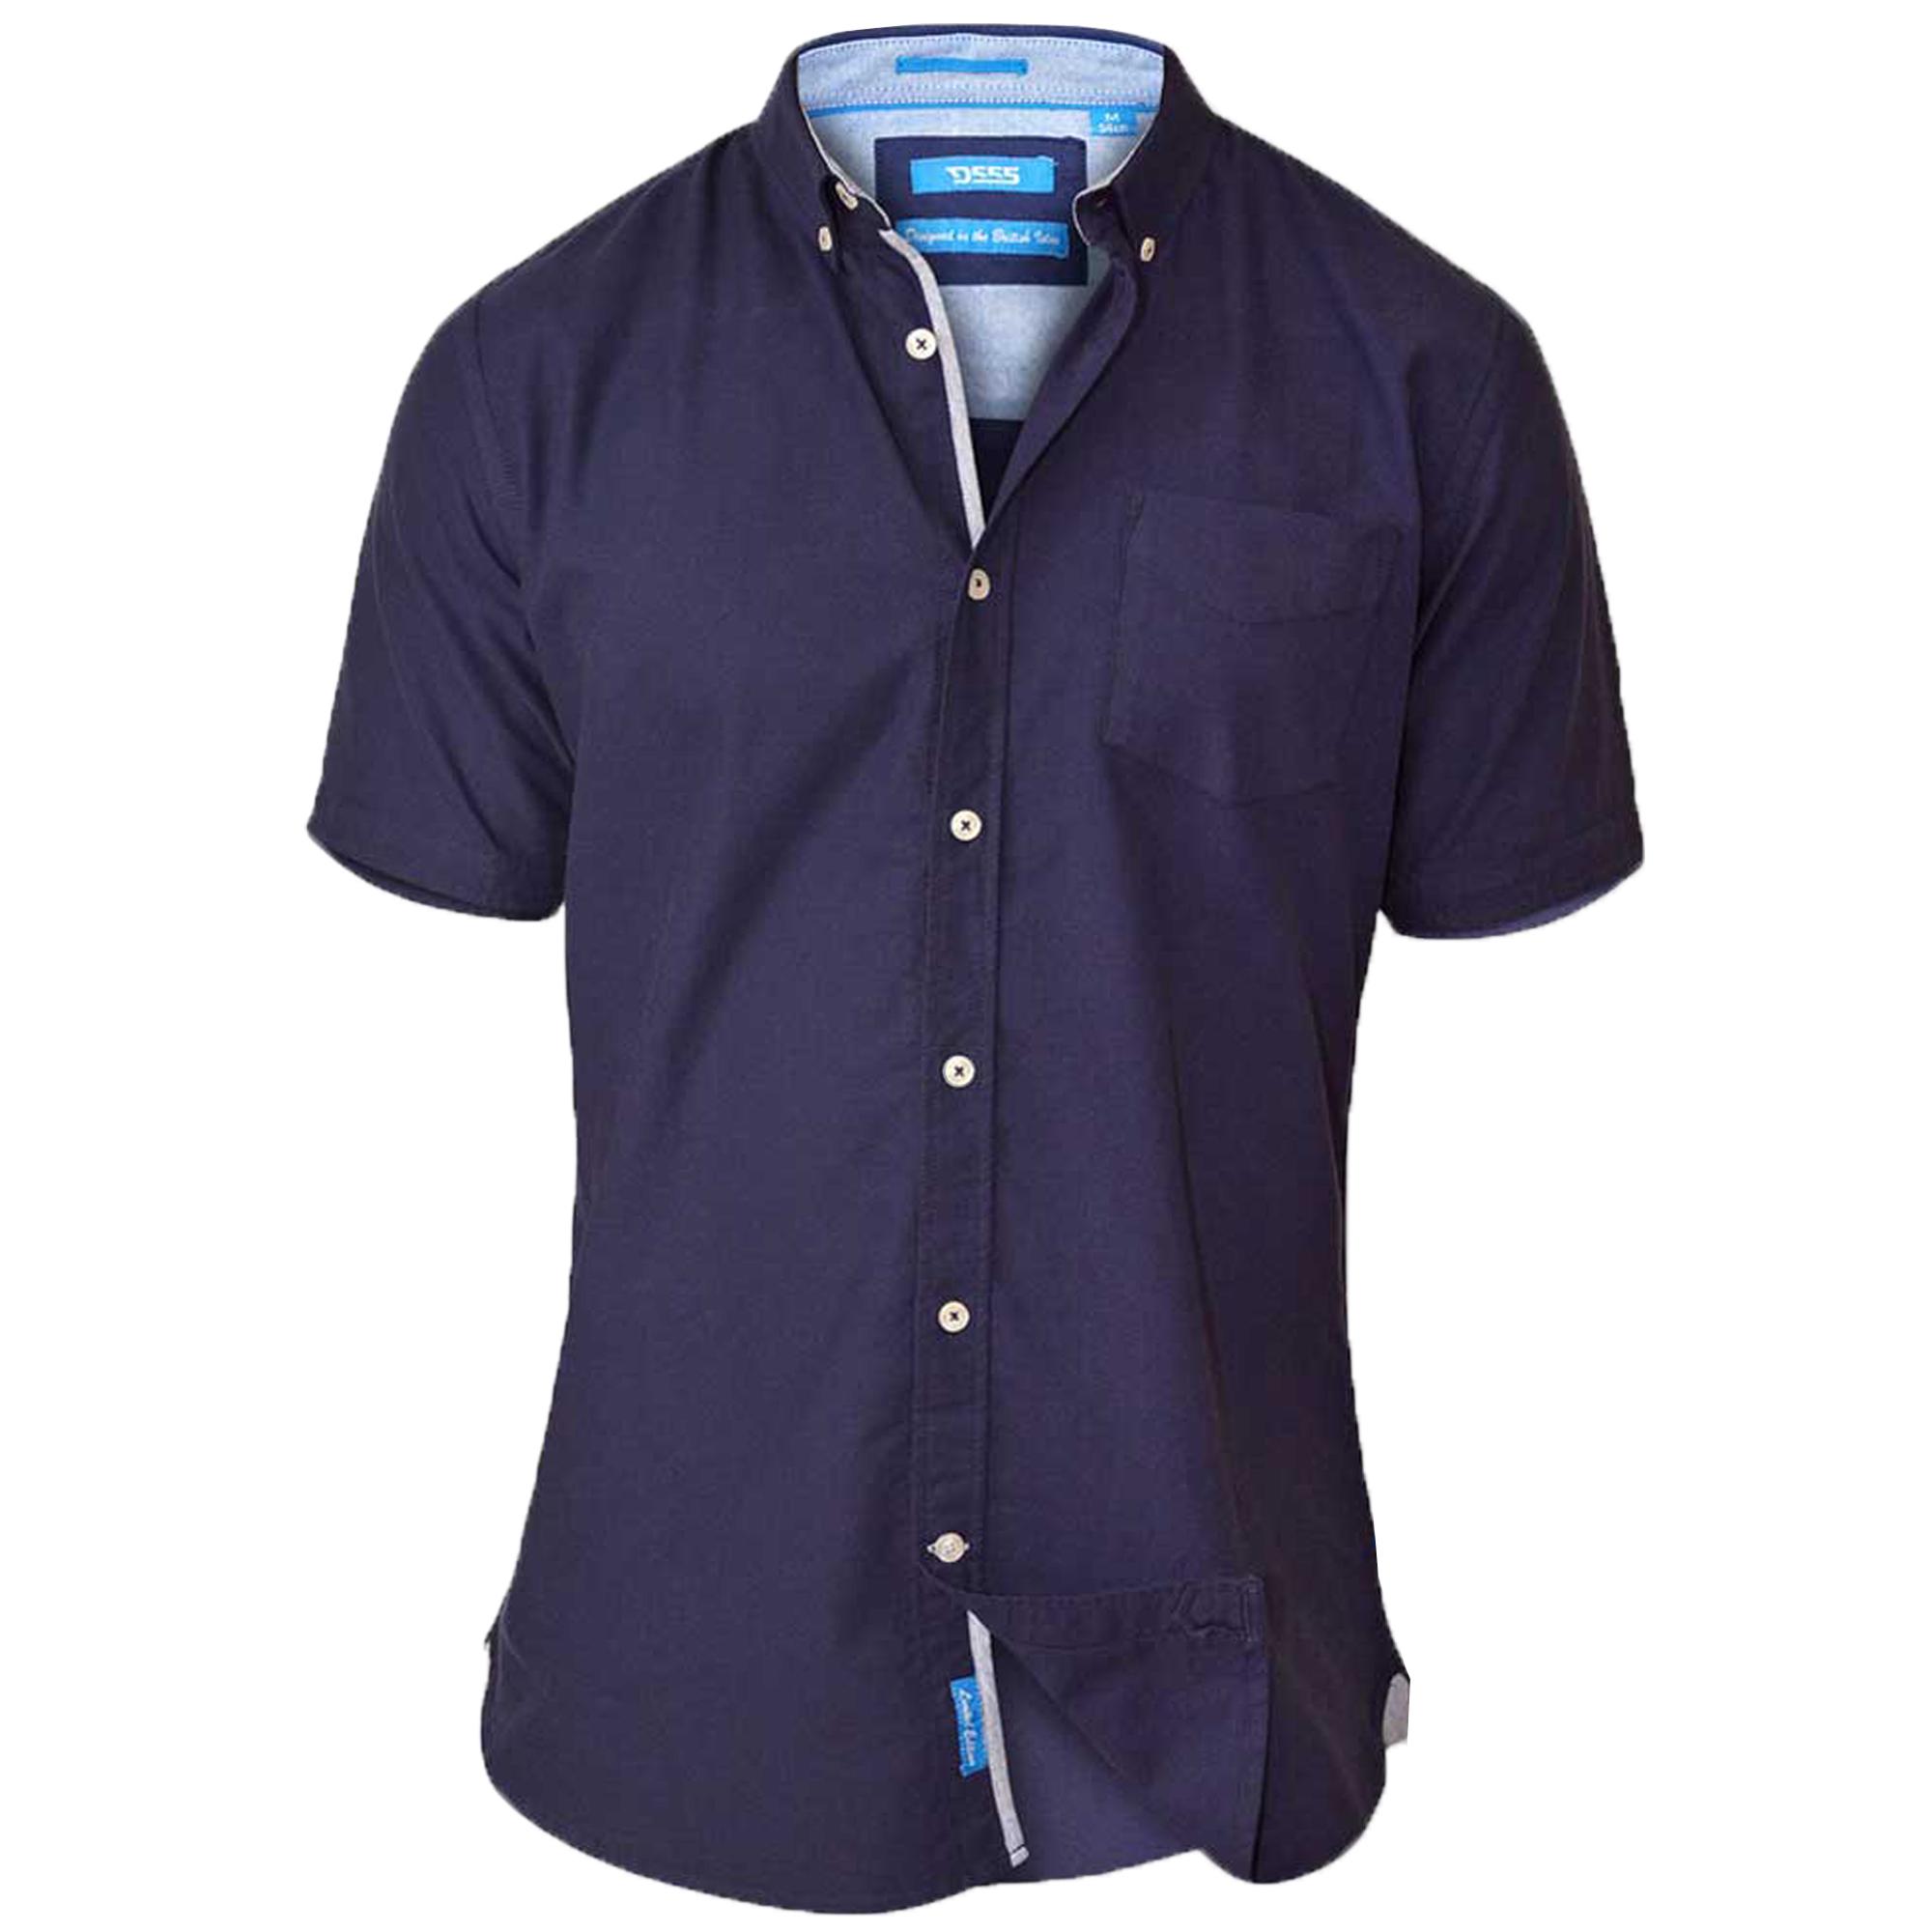 Mens Cotton Chambray Shirt D555 Duke Short Sleeved Big